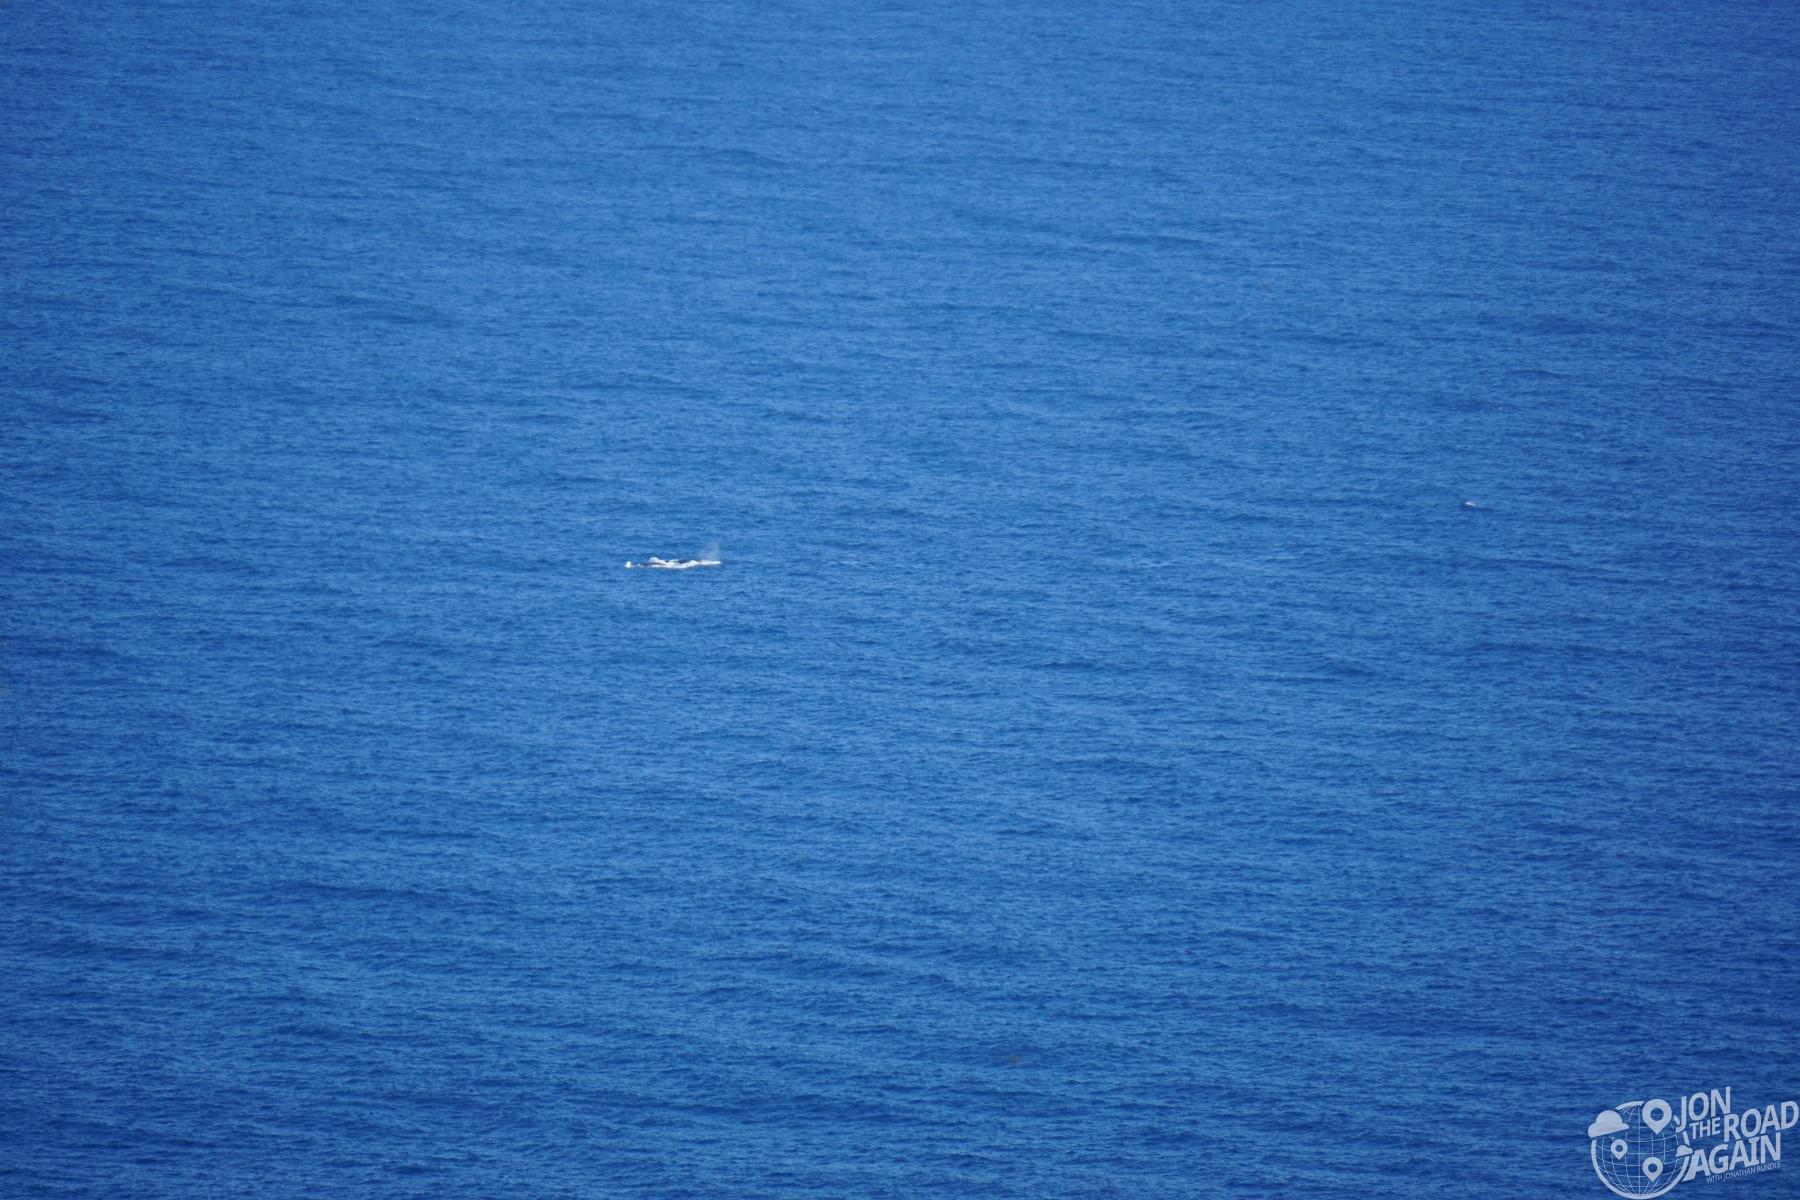 Whale at Waipio Valley